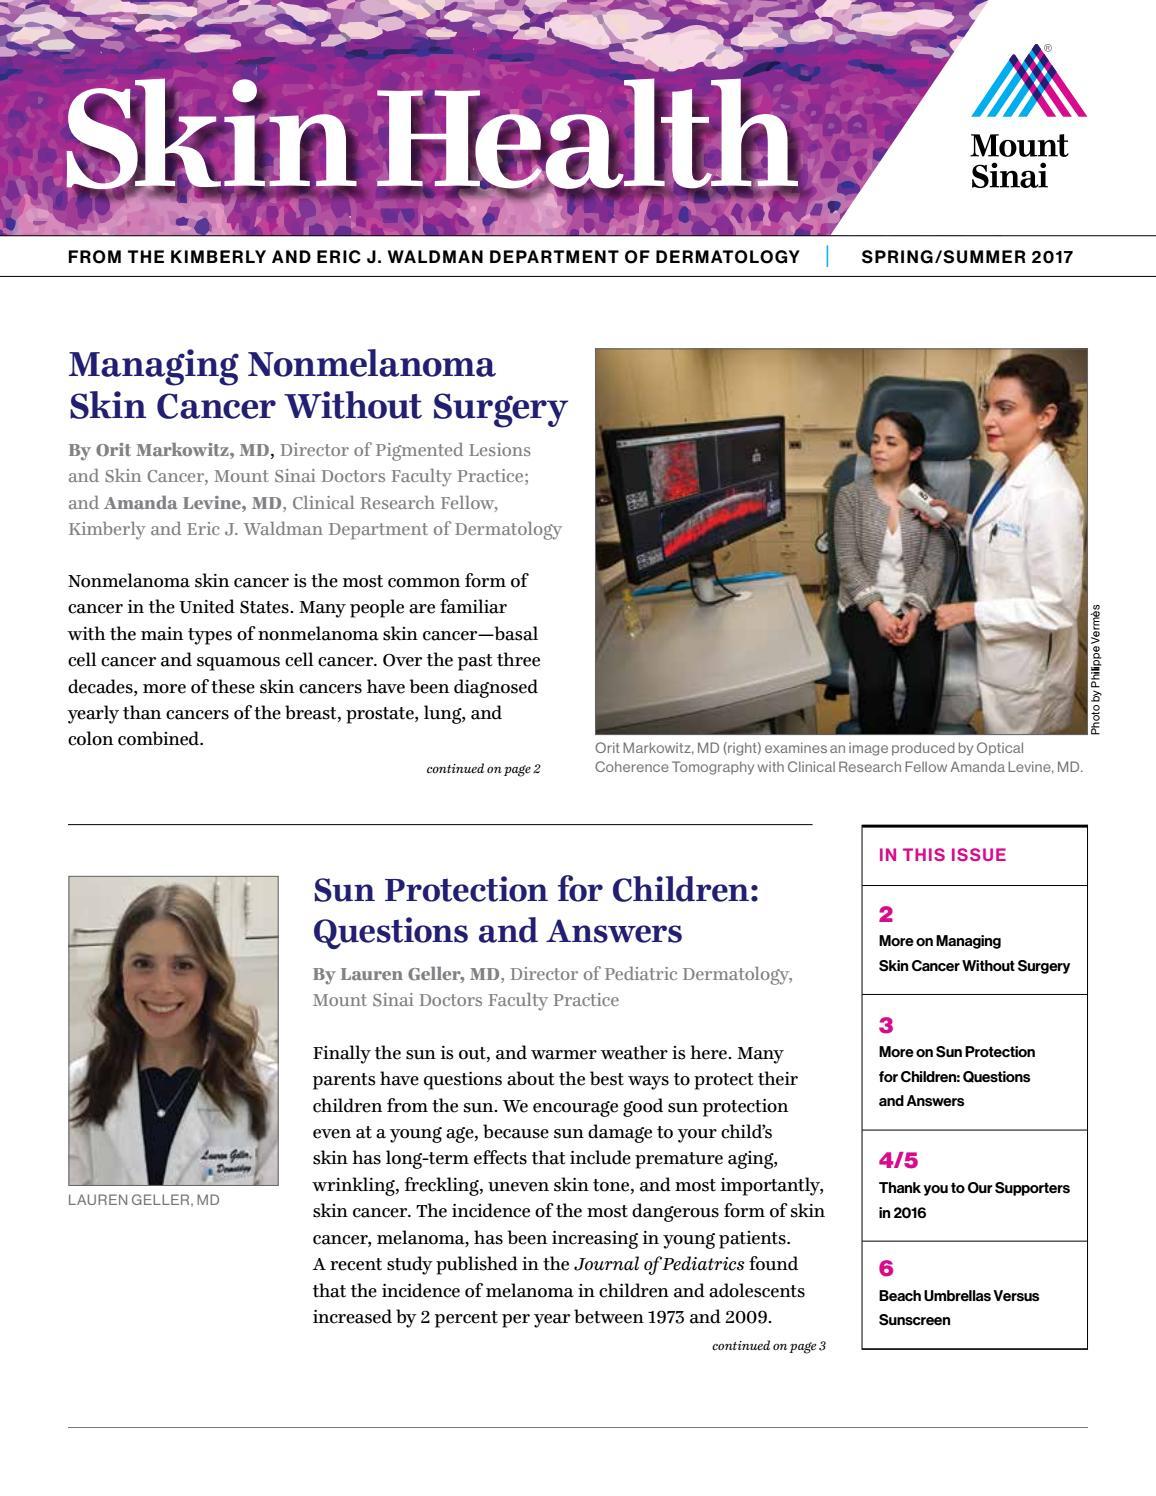 Dermatology - Spring/Summer 2017 Newsletter by Mount Sinai